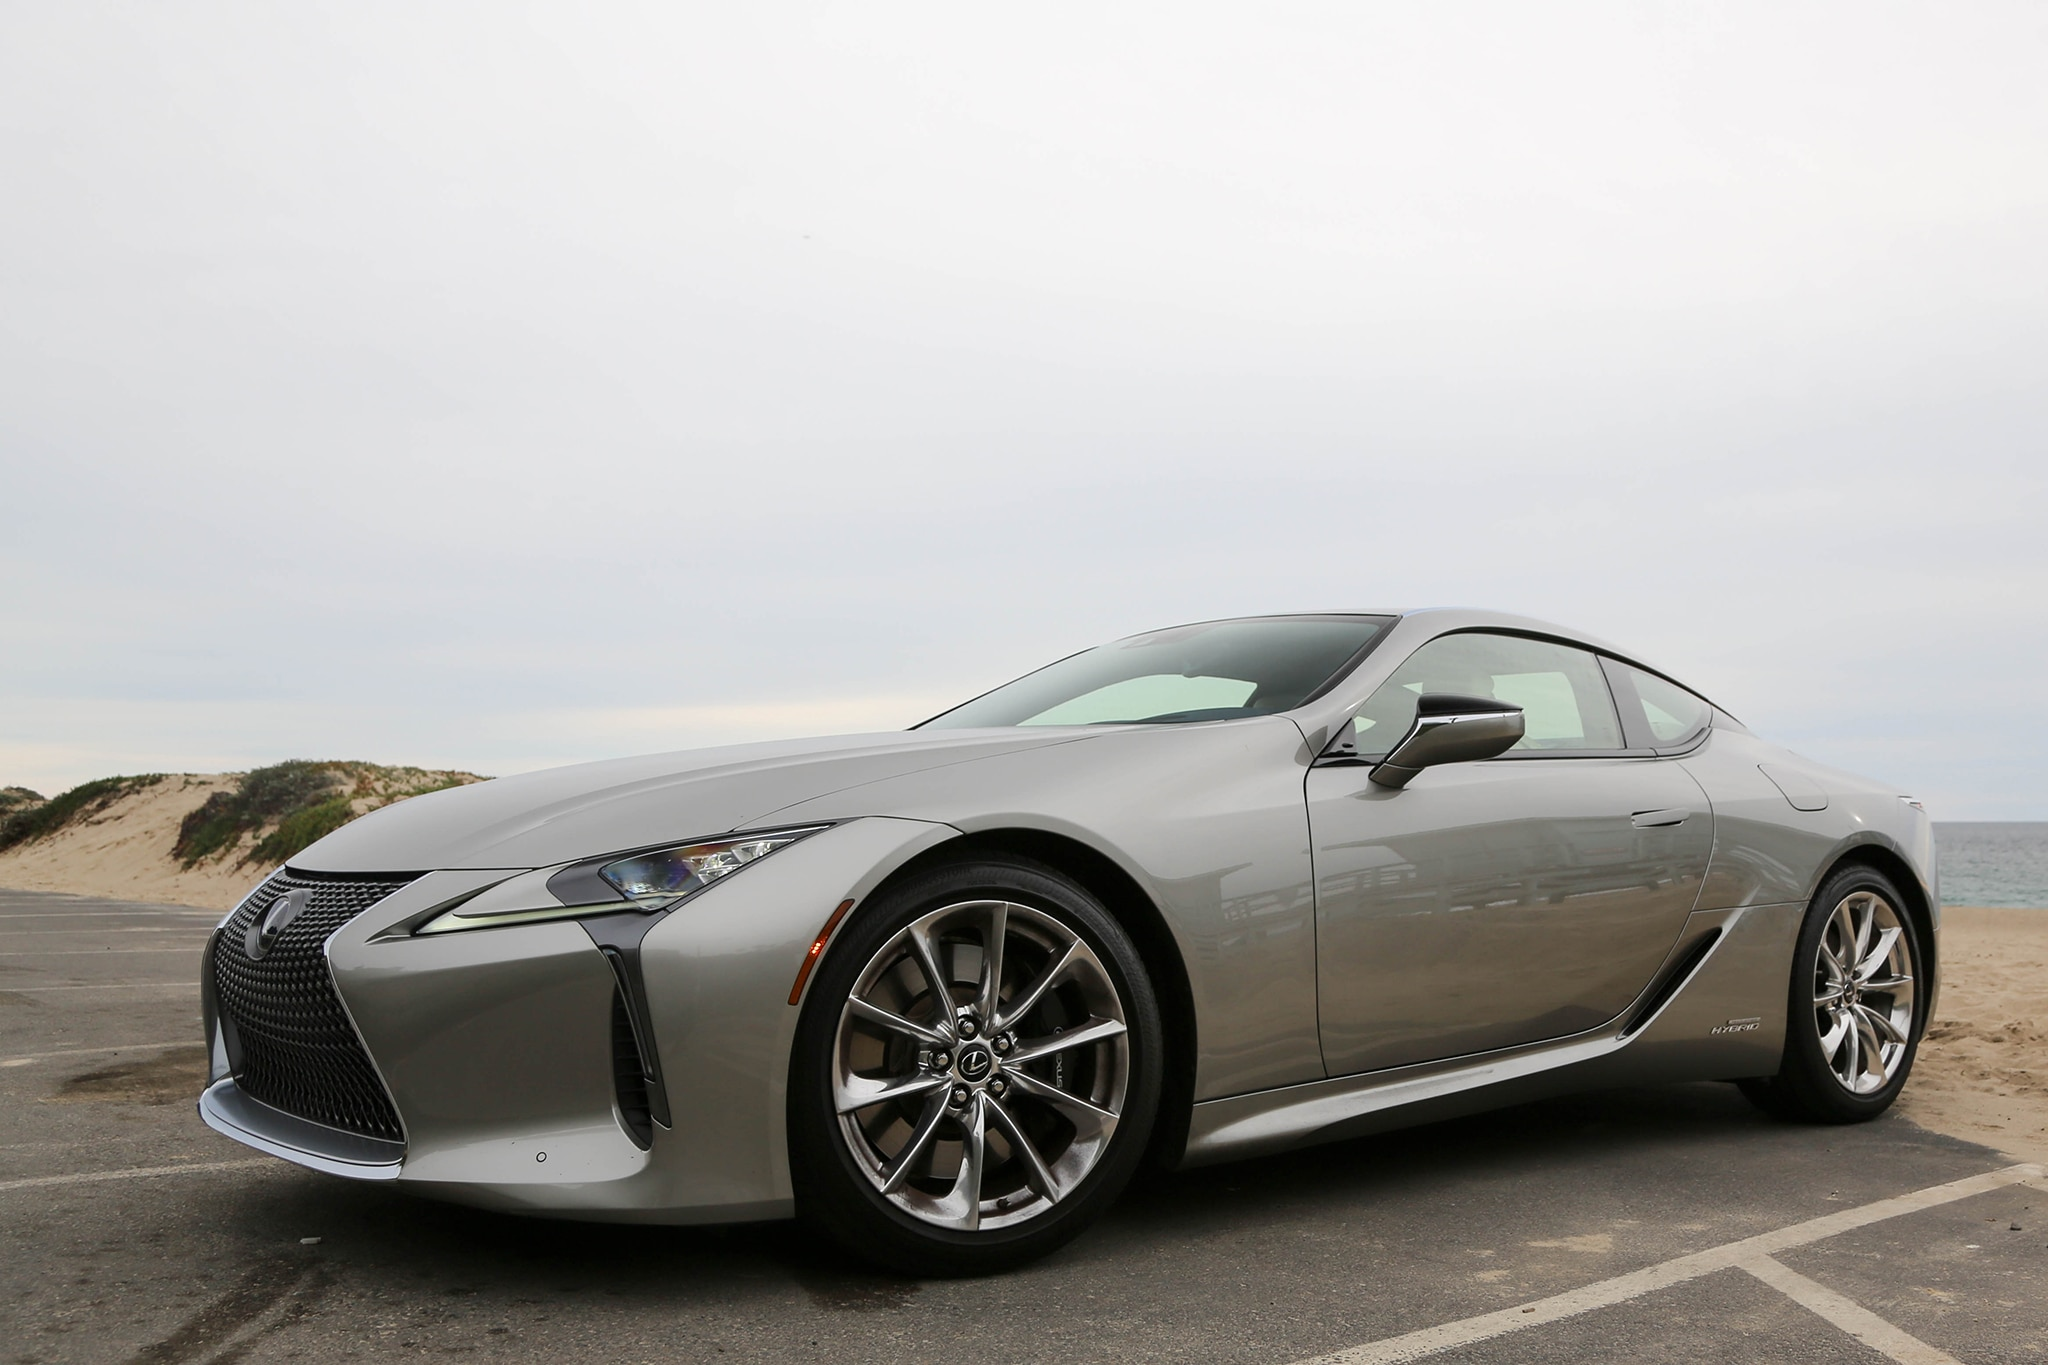 https://st.automobilemag.com/uploads/sites/11/2018/05/2018-Lexus-LC-500h-1.jpg